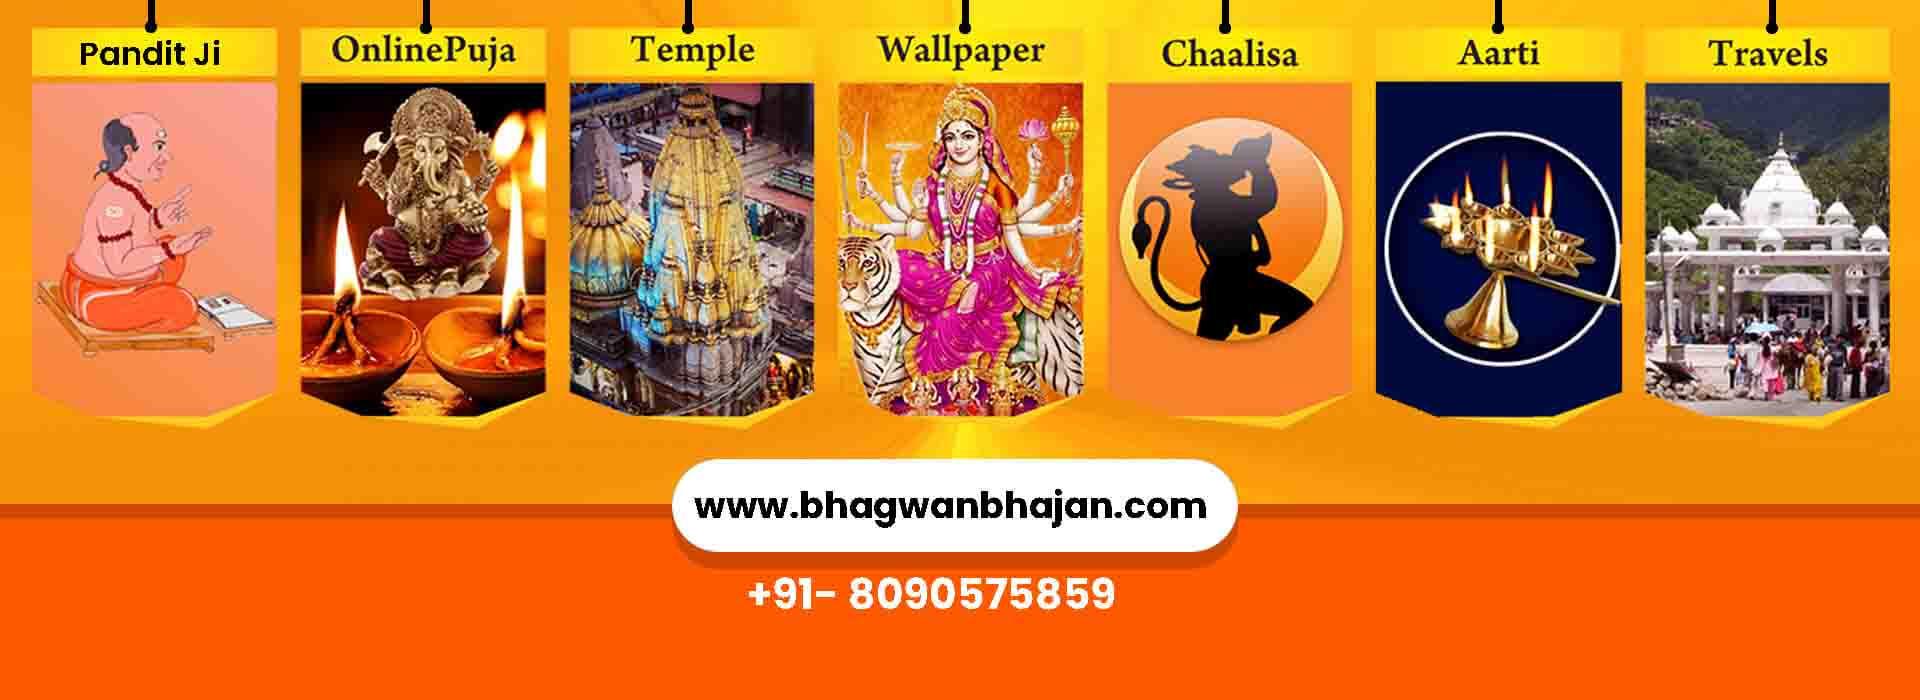 Book Online Puja, Spiritual Travel, Panditji Online on Bhagwanbhajan.com